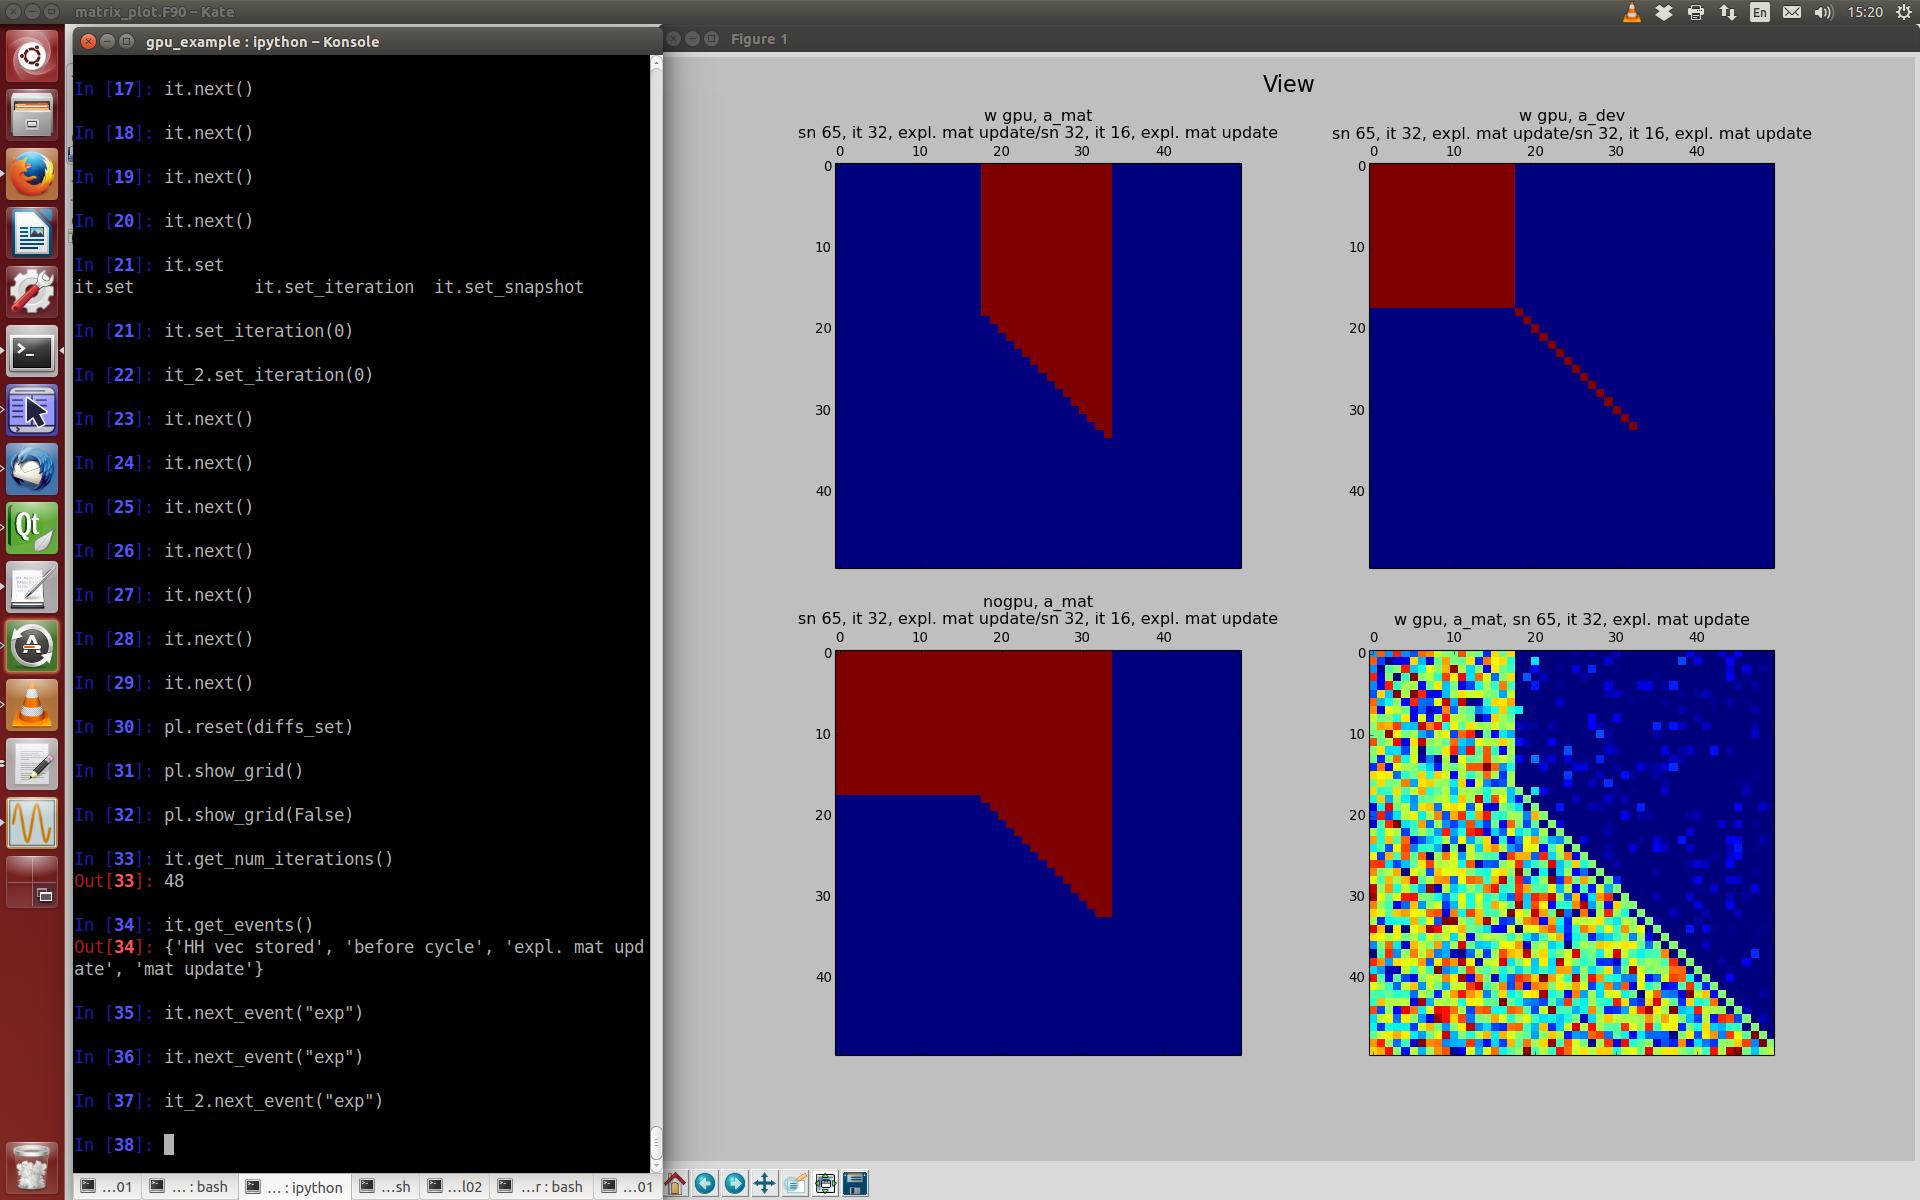 utils/matrix_plotter/gpu_example/screenshot.png